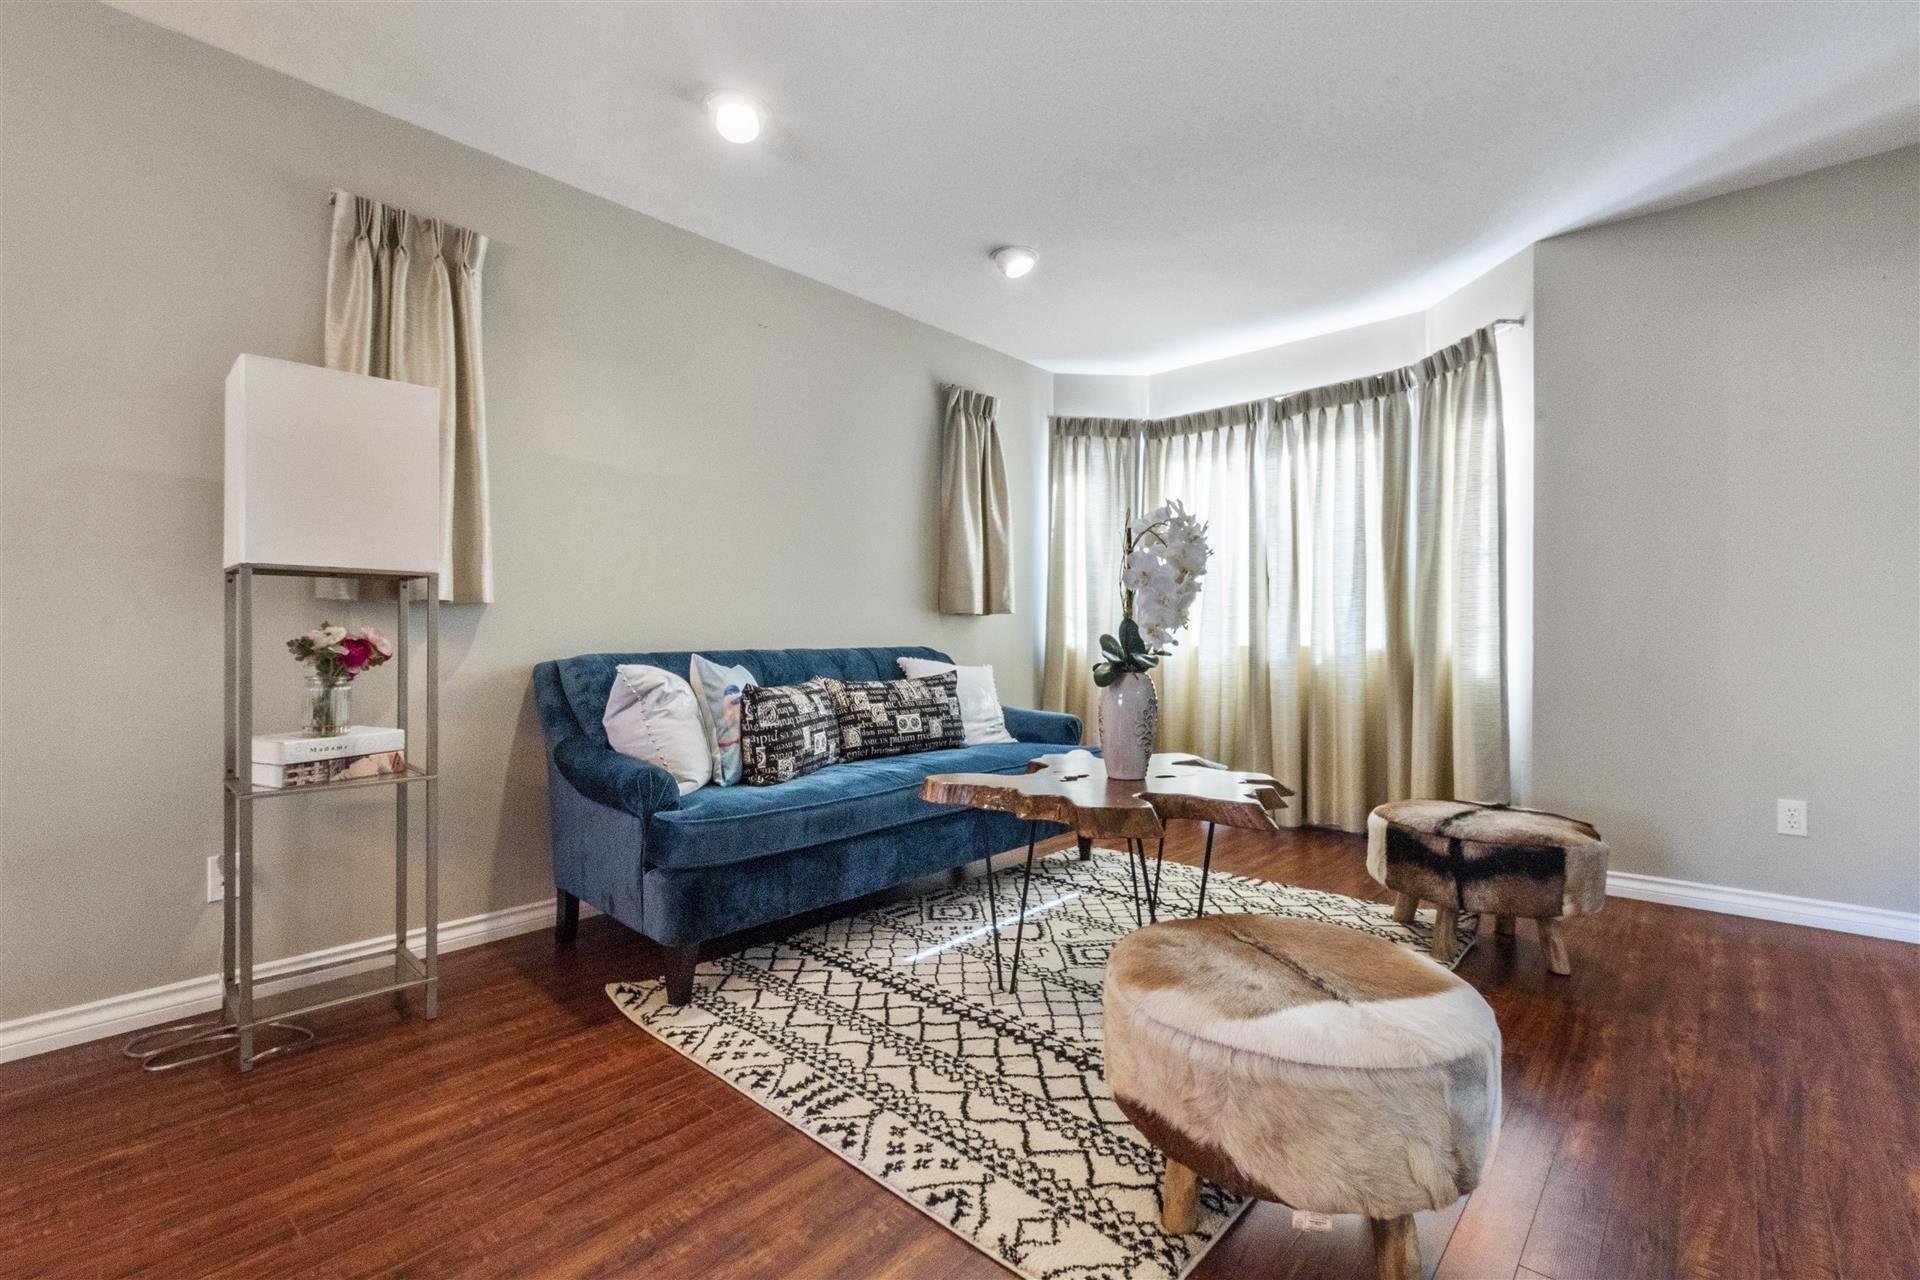 3631 GEORGIA STREET - Steveston Village House/Single Family for sale, 3 Bedrooms (R2623894) - #2